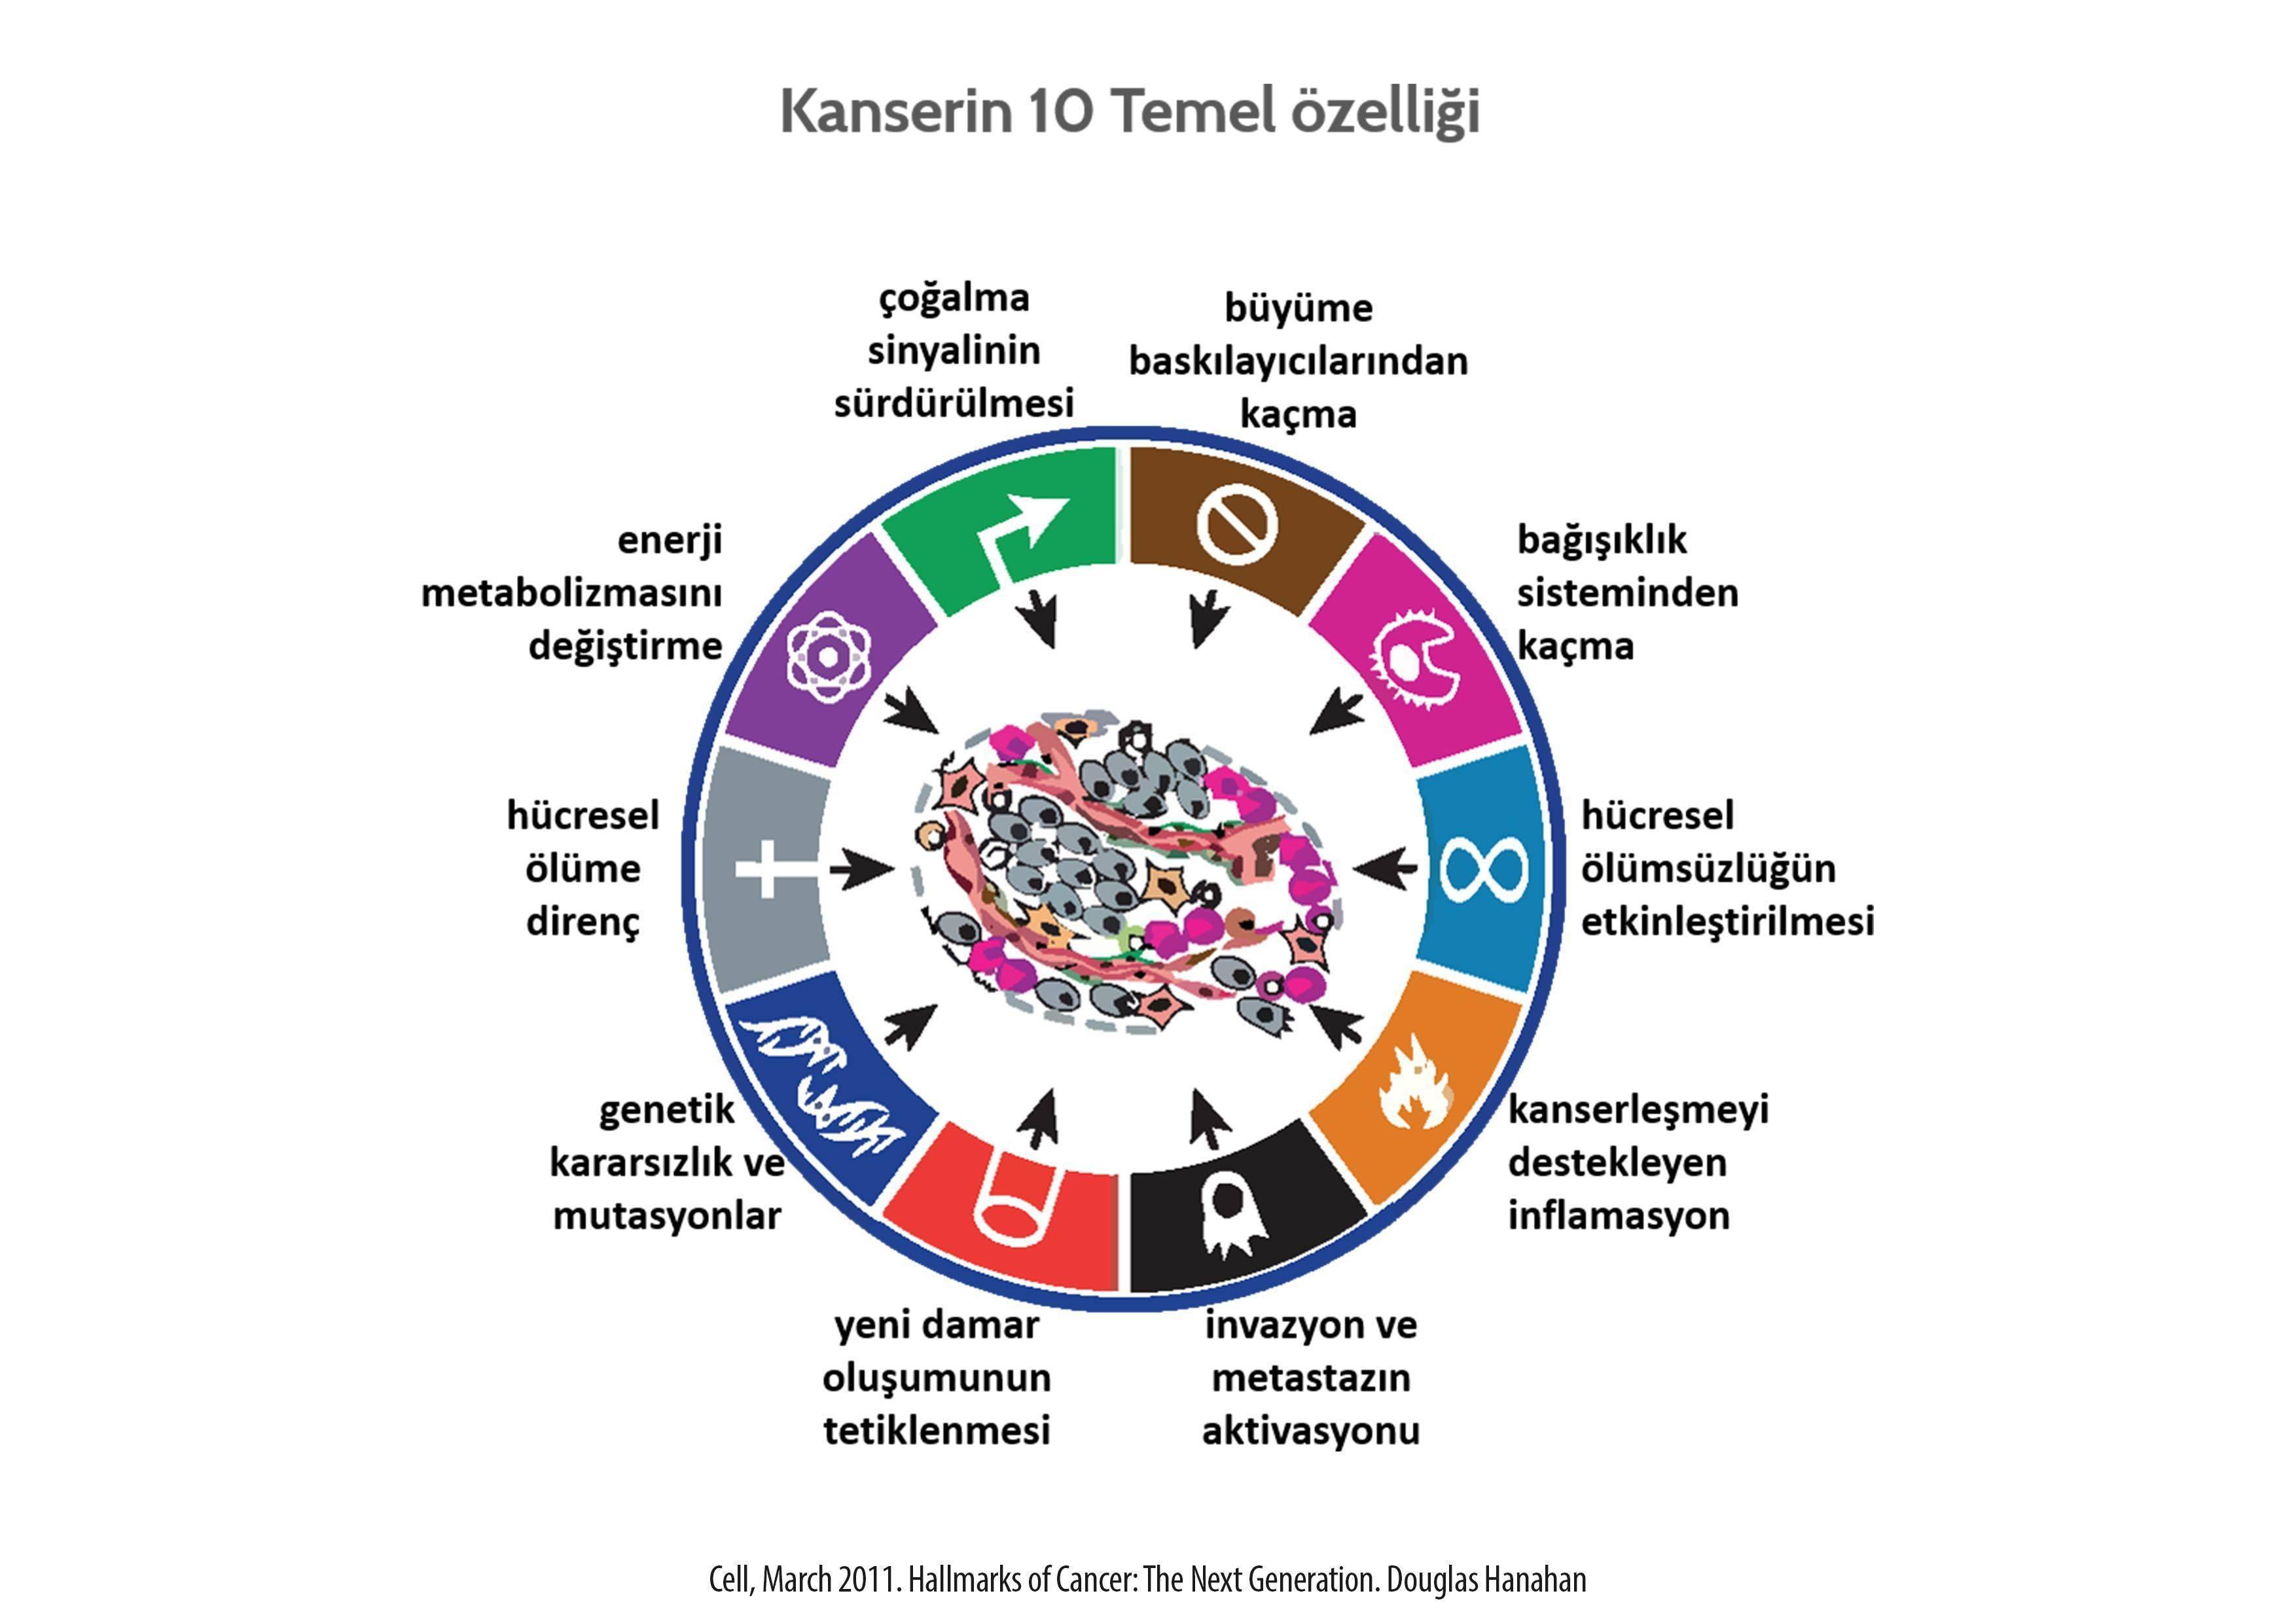 Kanserin 10 temel ozelligi